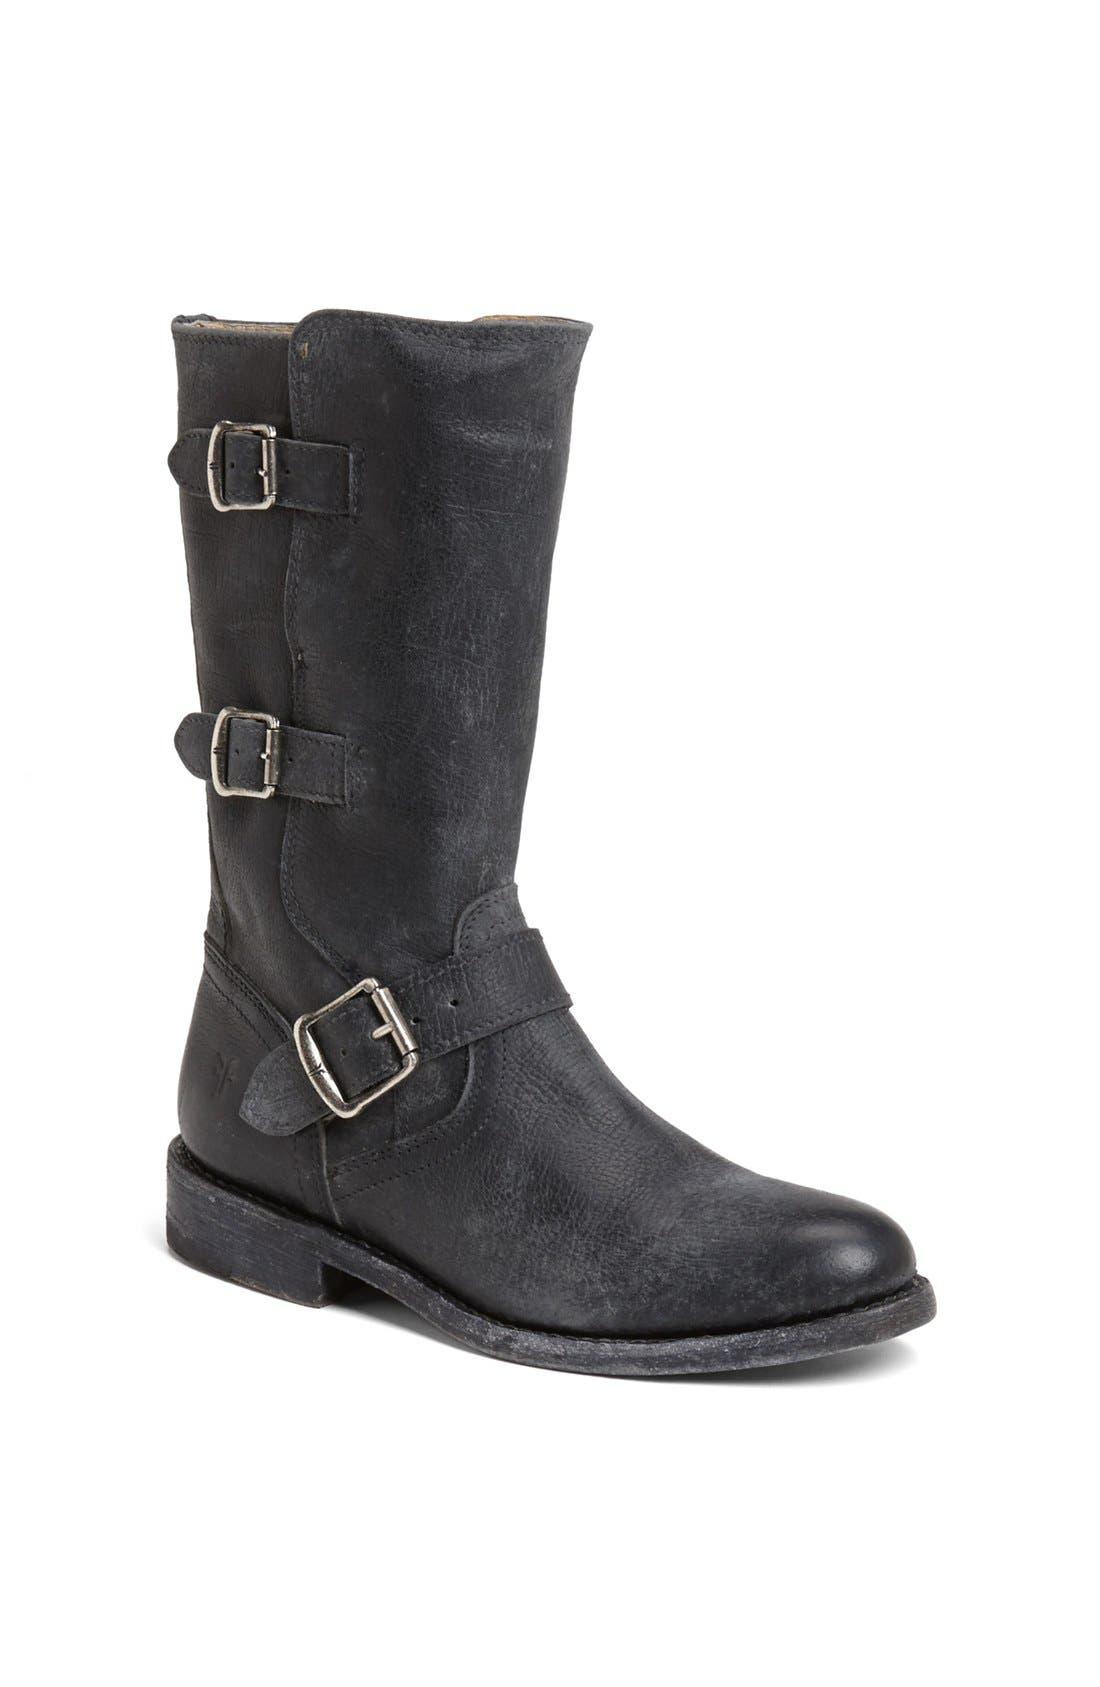 Main Image - Frye 'Jayden' Leather Moto Boot